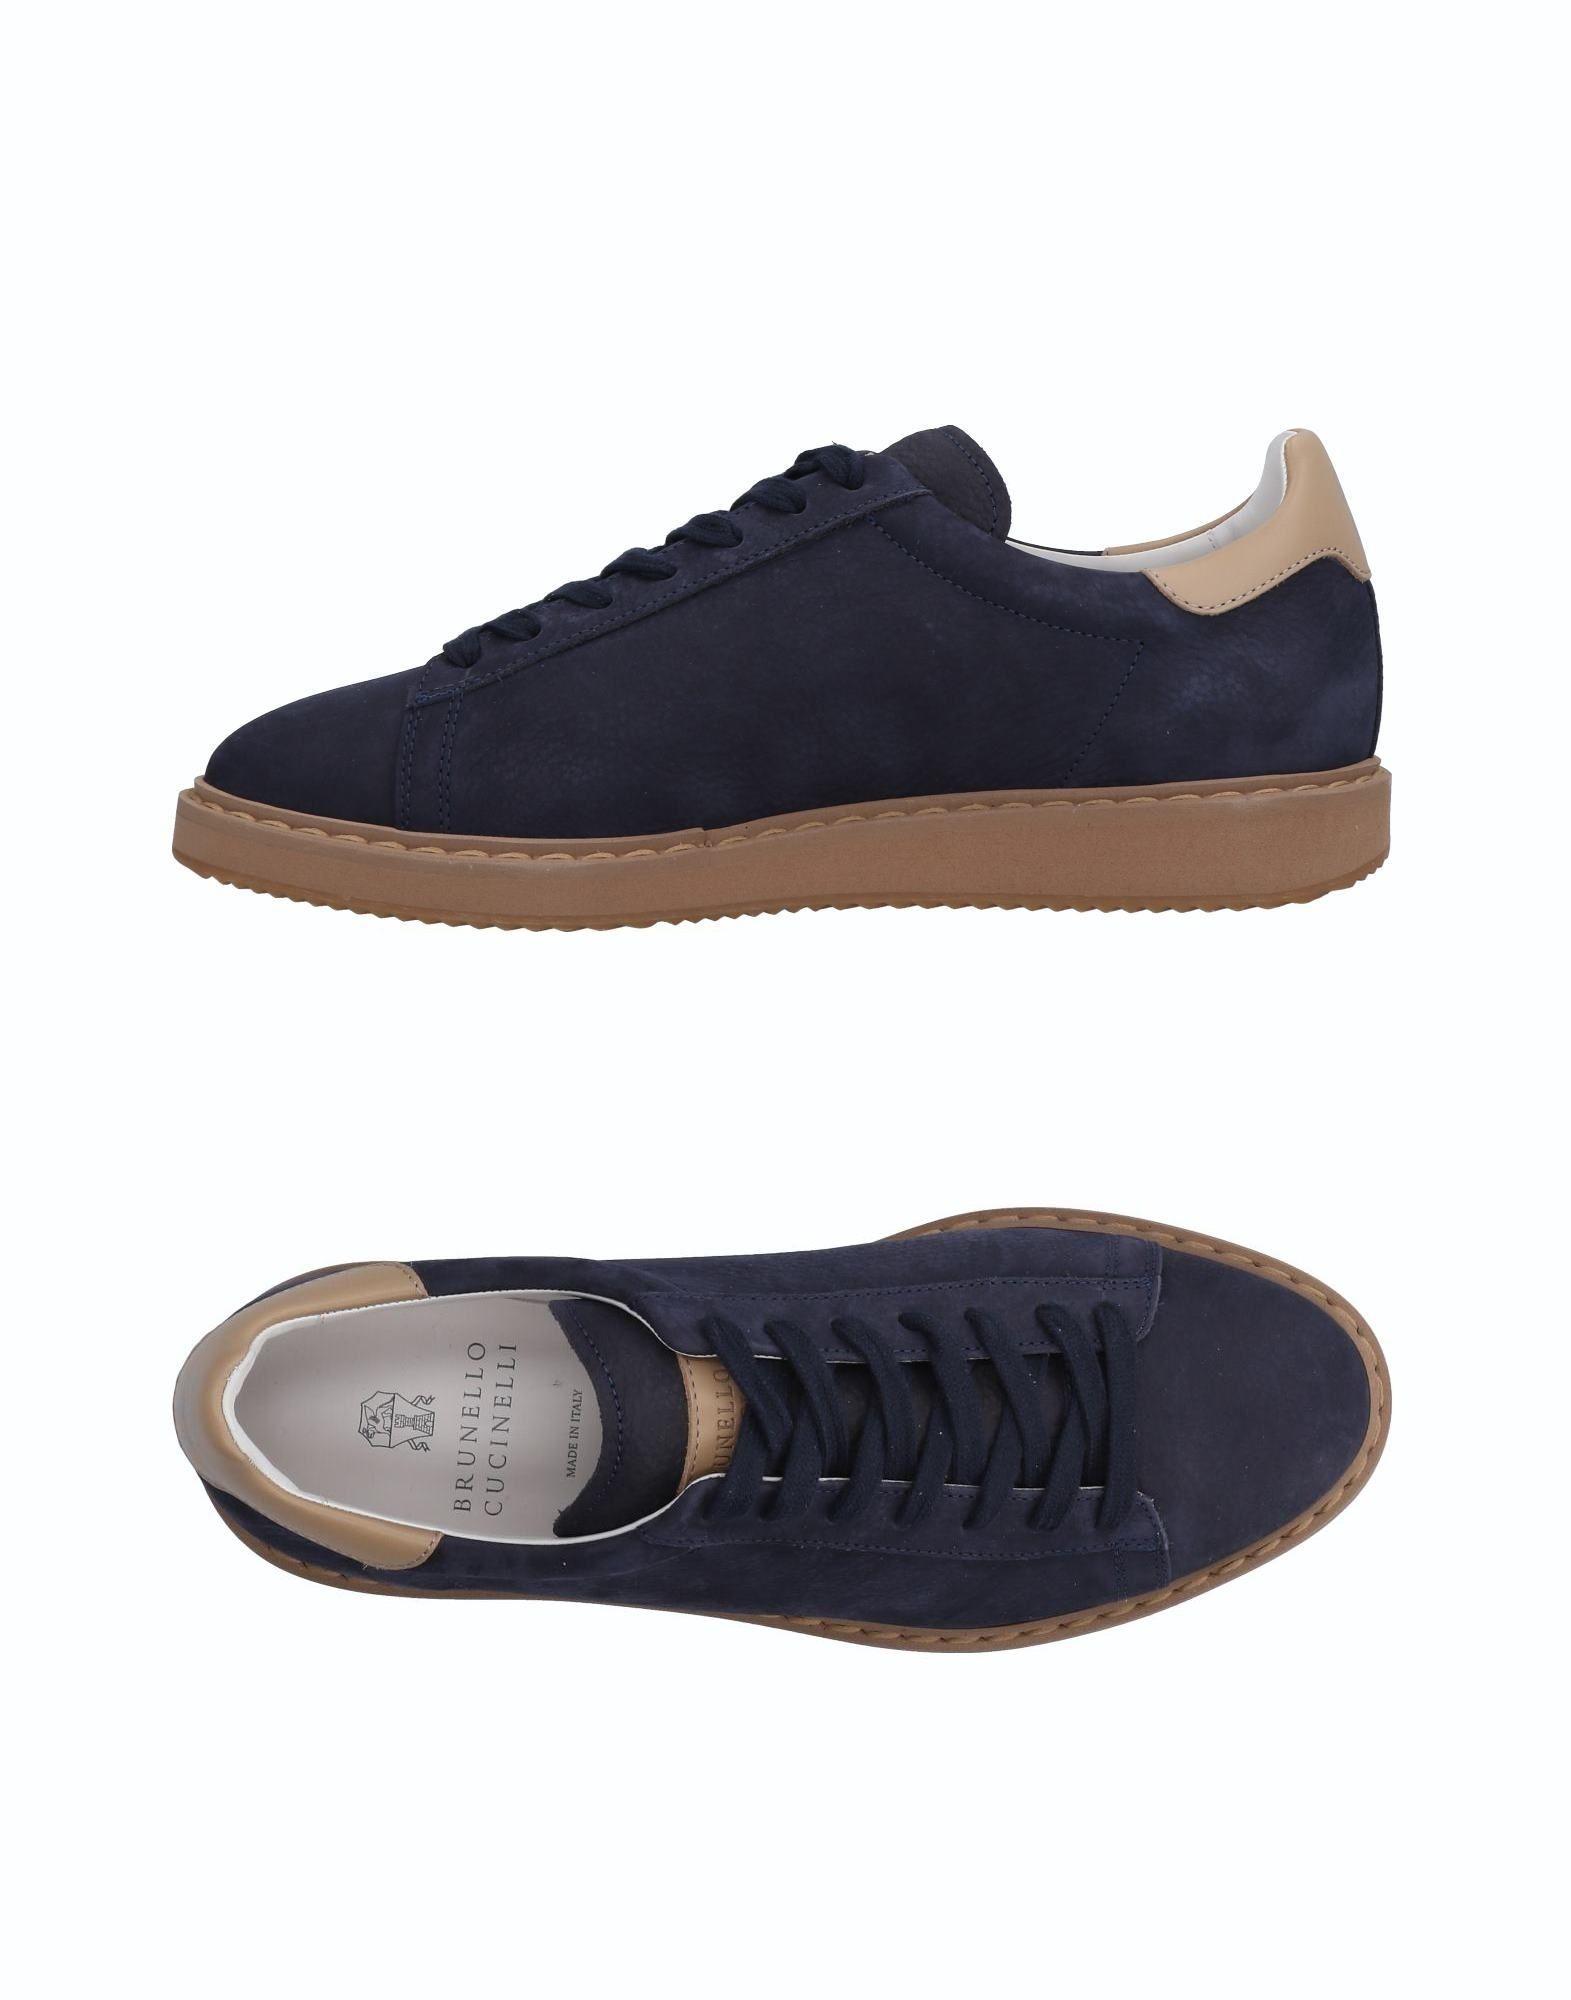 Brunello Cucinelli Sneakers Herren  11504866AS Gute Qualität beliebte Schuhe